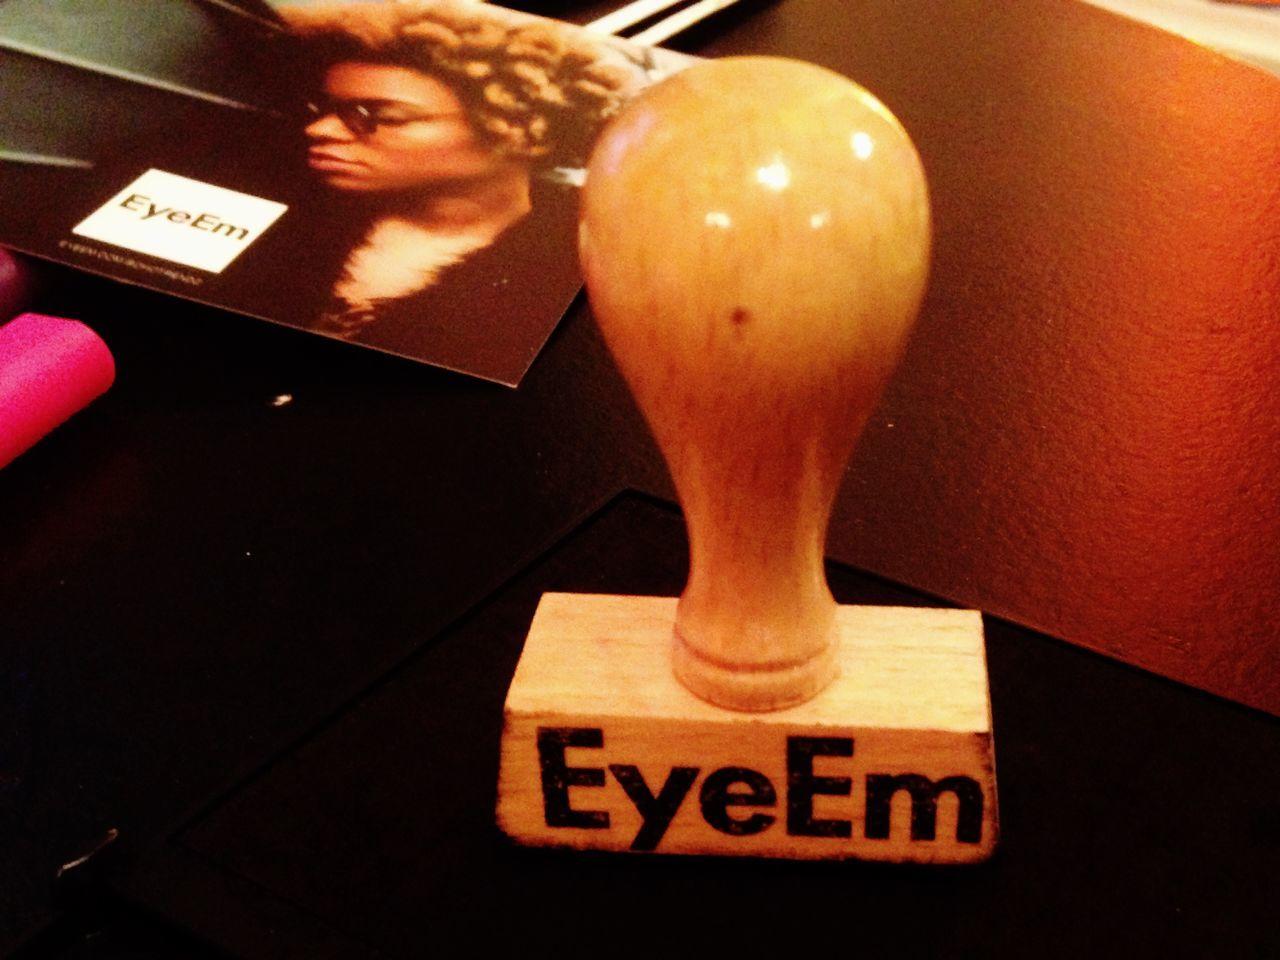 Eyeemfestival16